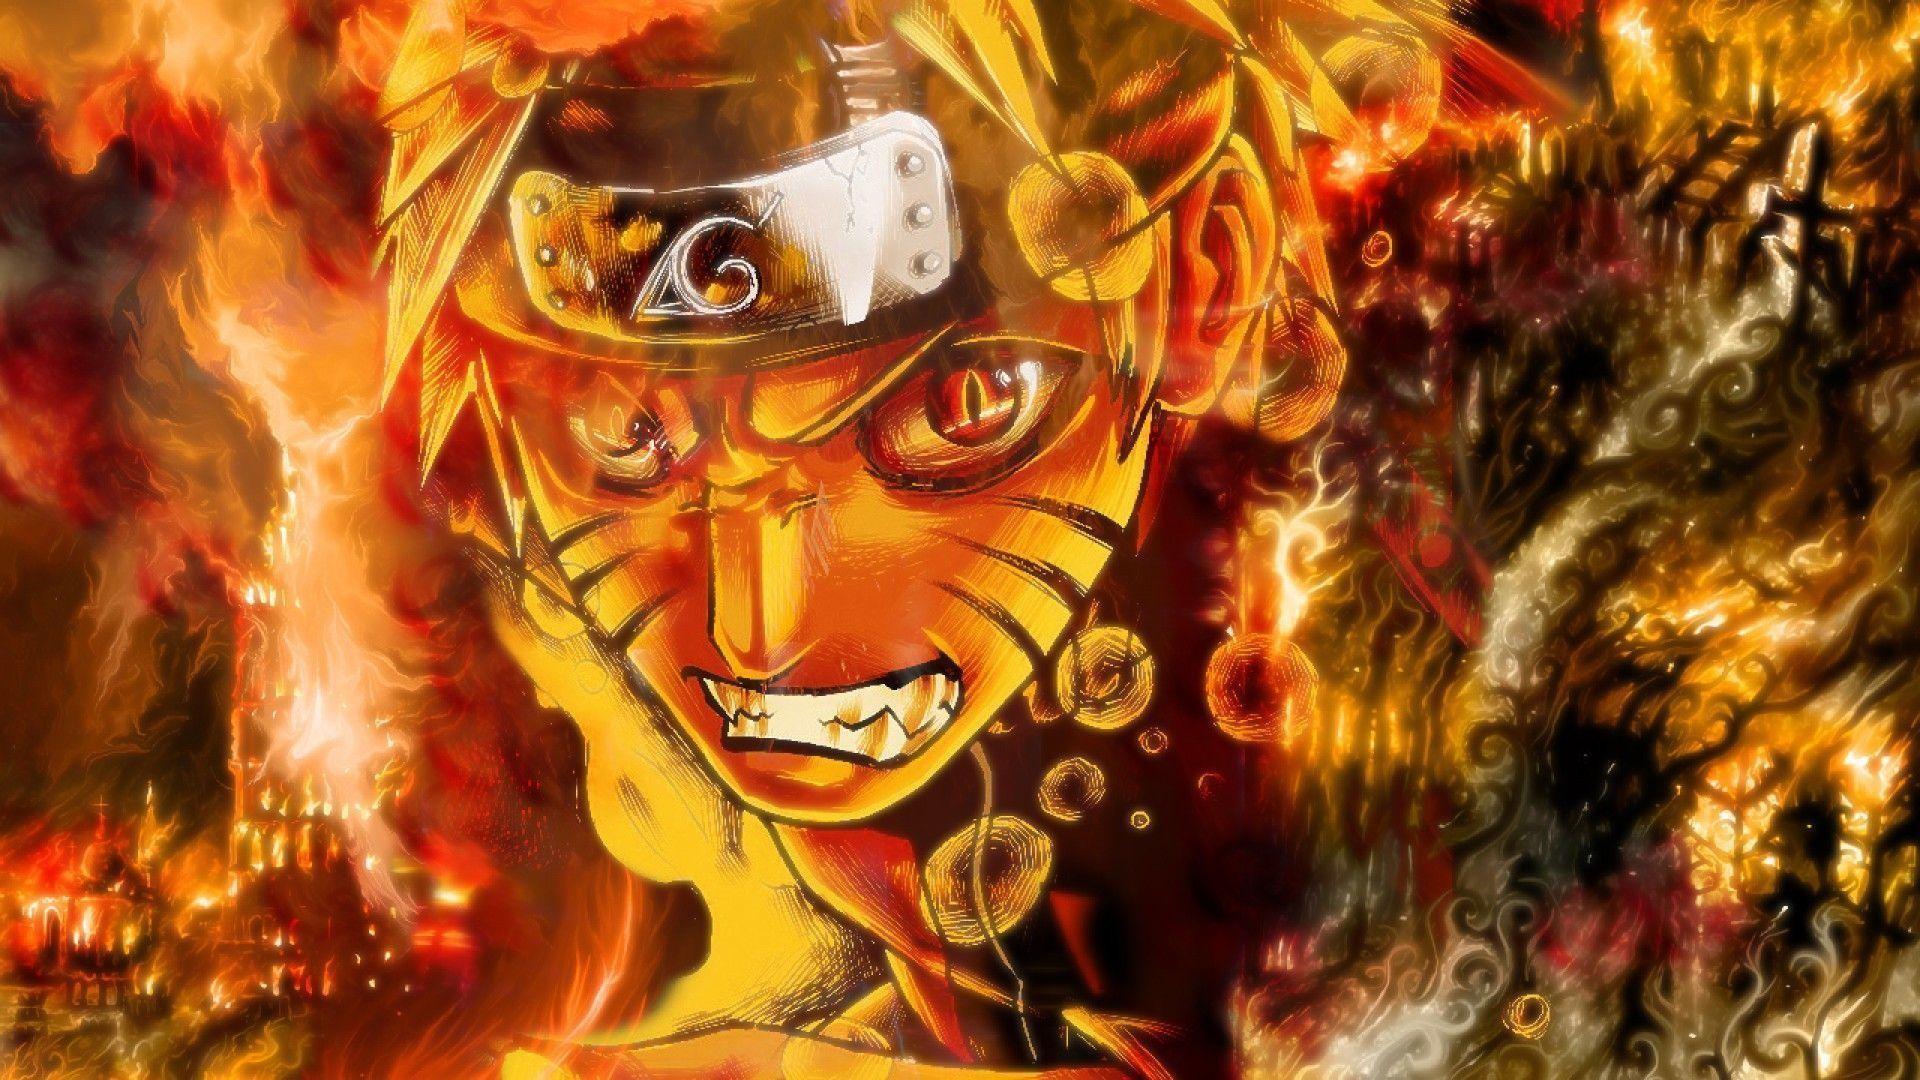 Wallpapers For > Naruto Kyuubi Wallpaper 1920×1080